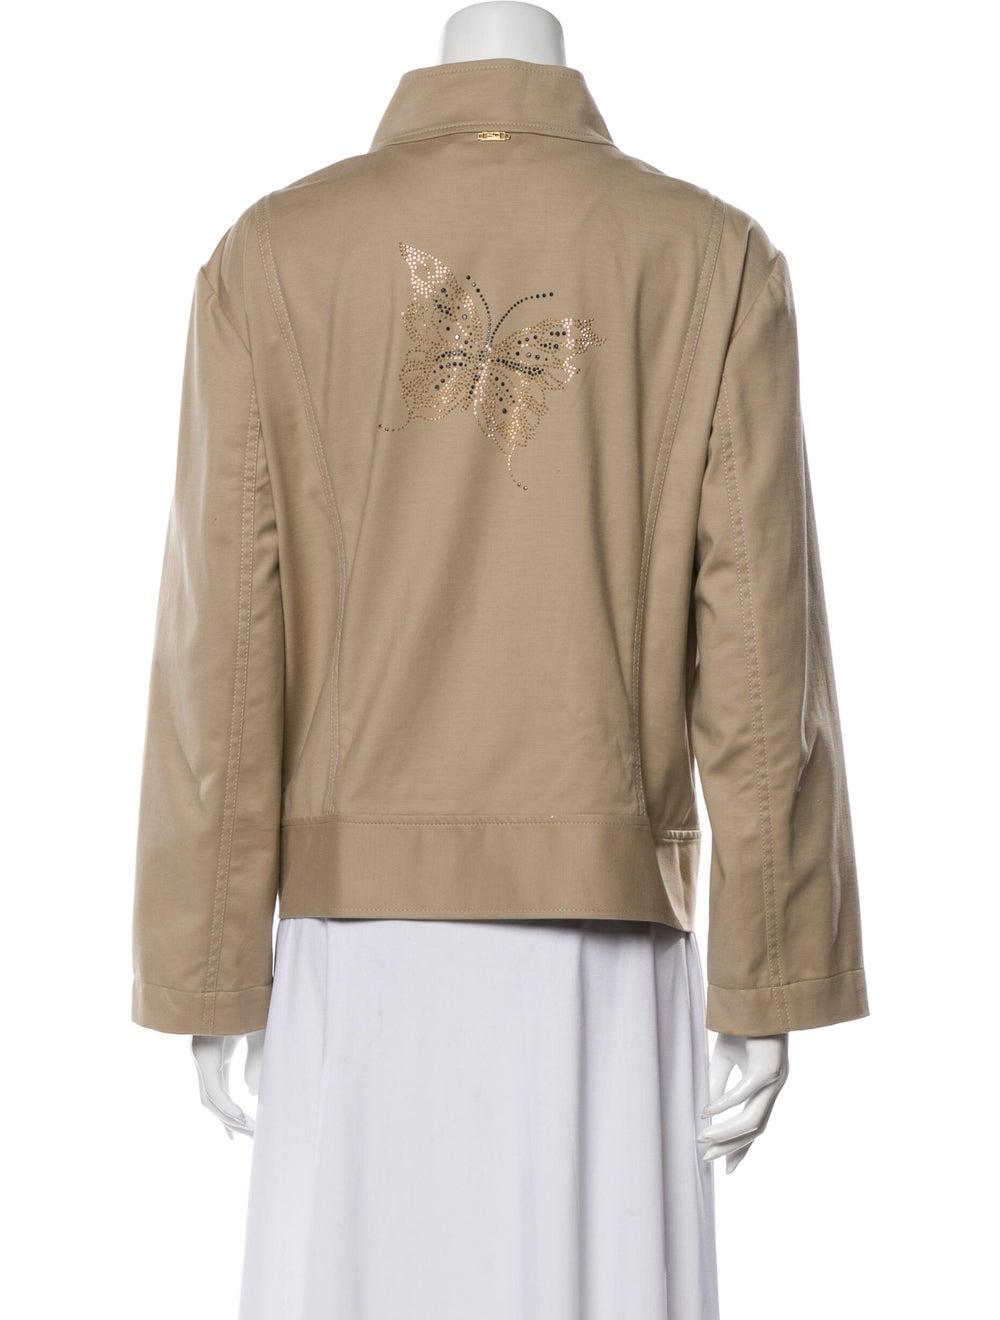 St. John Sport Jacket - image 3